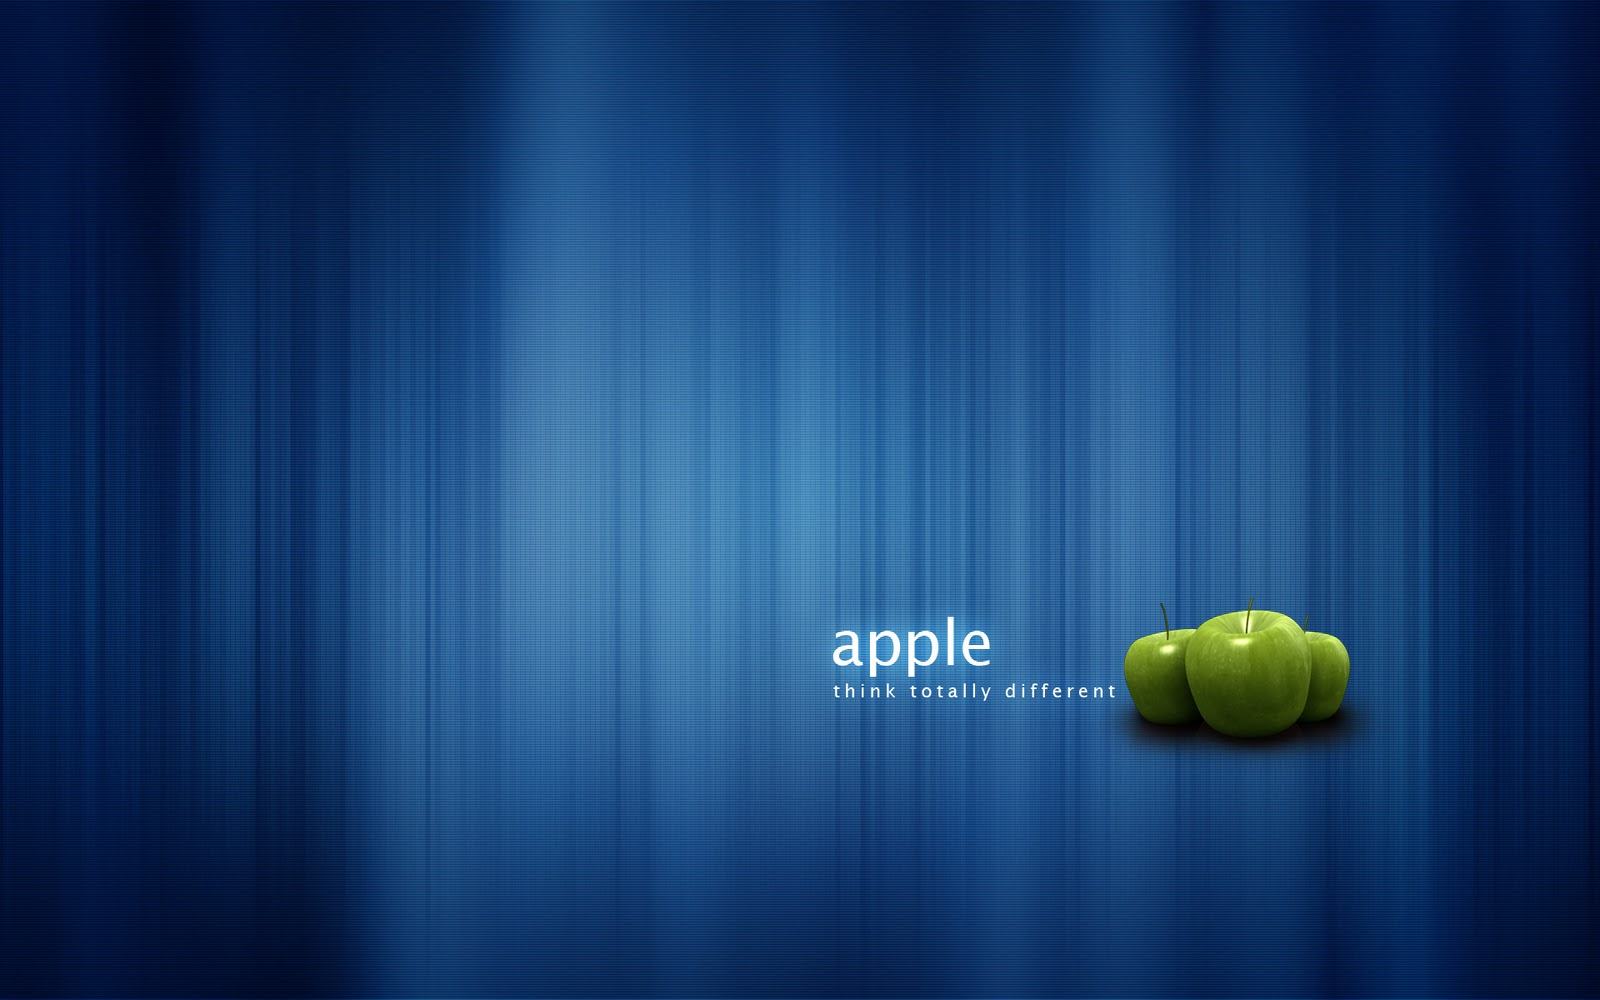 Best desktop hd wallpaper apple hd wallpapers for Various wallpapers